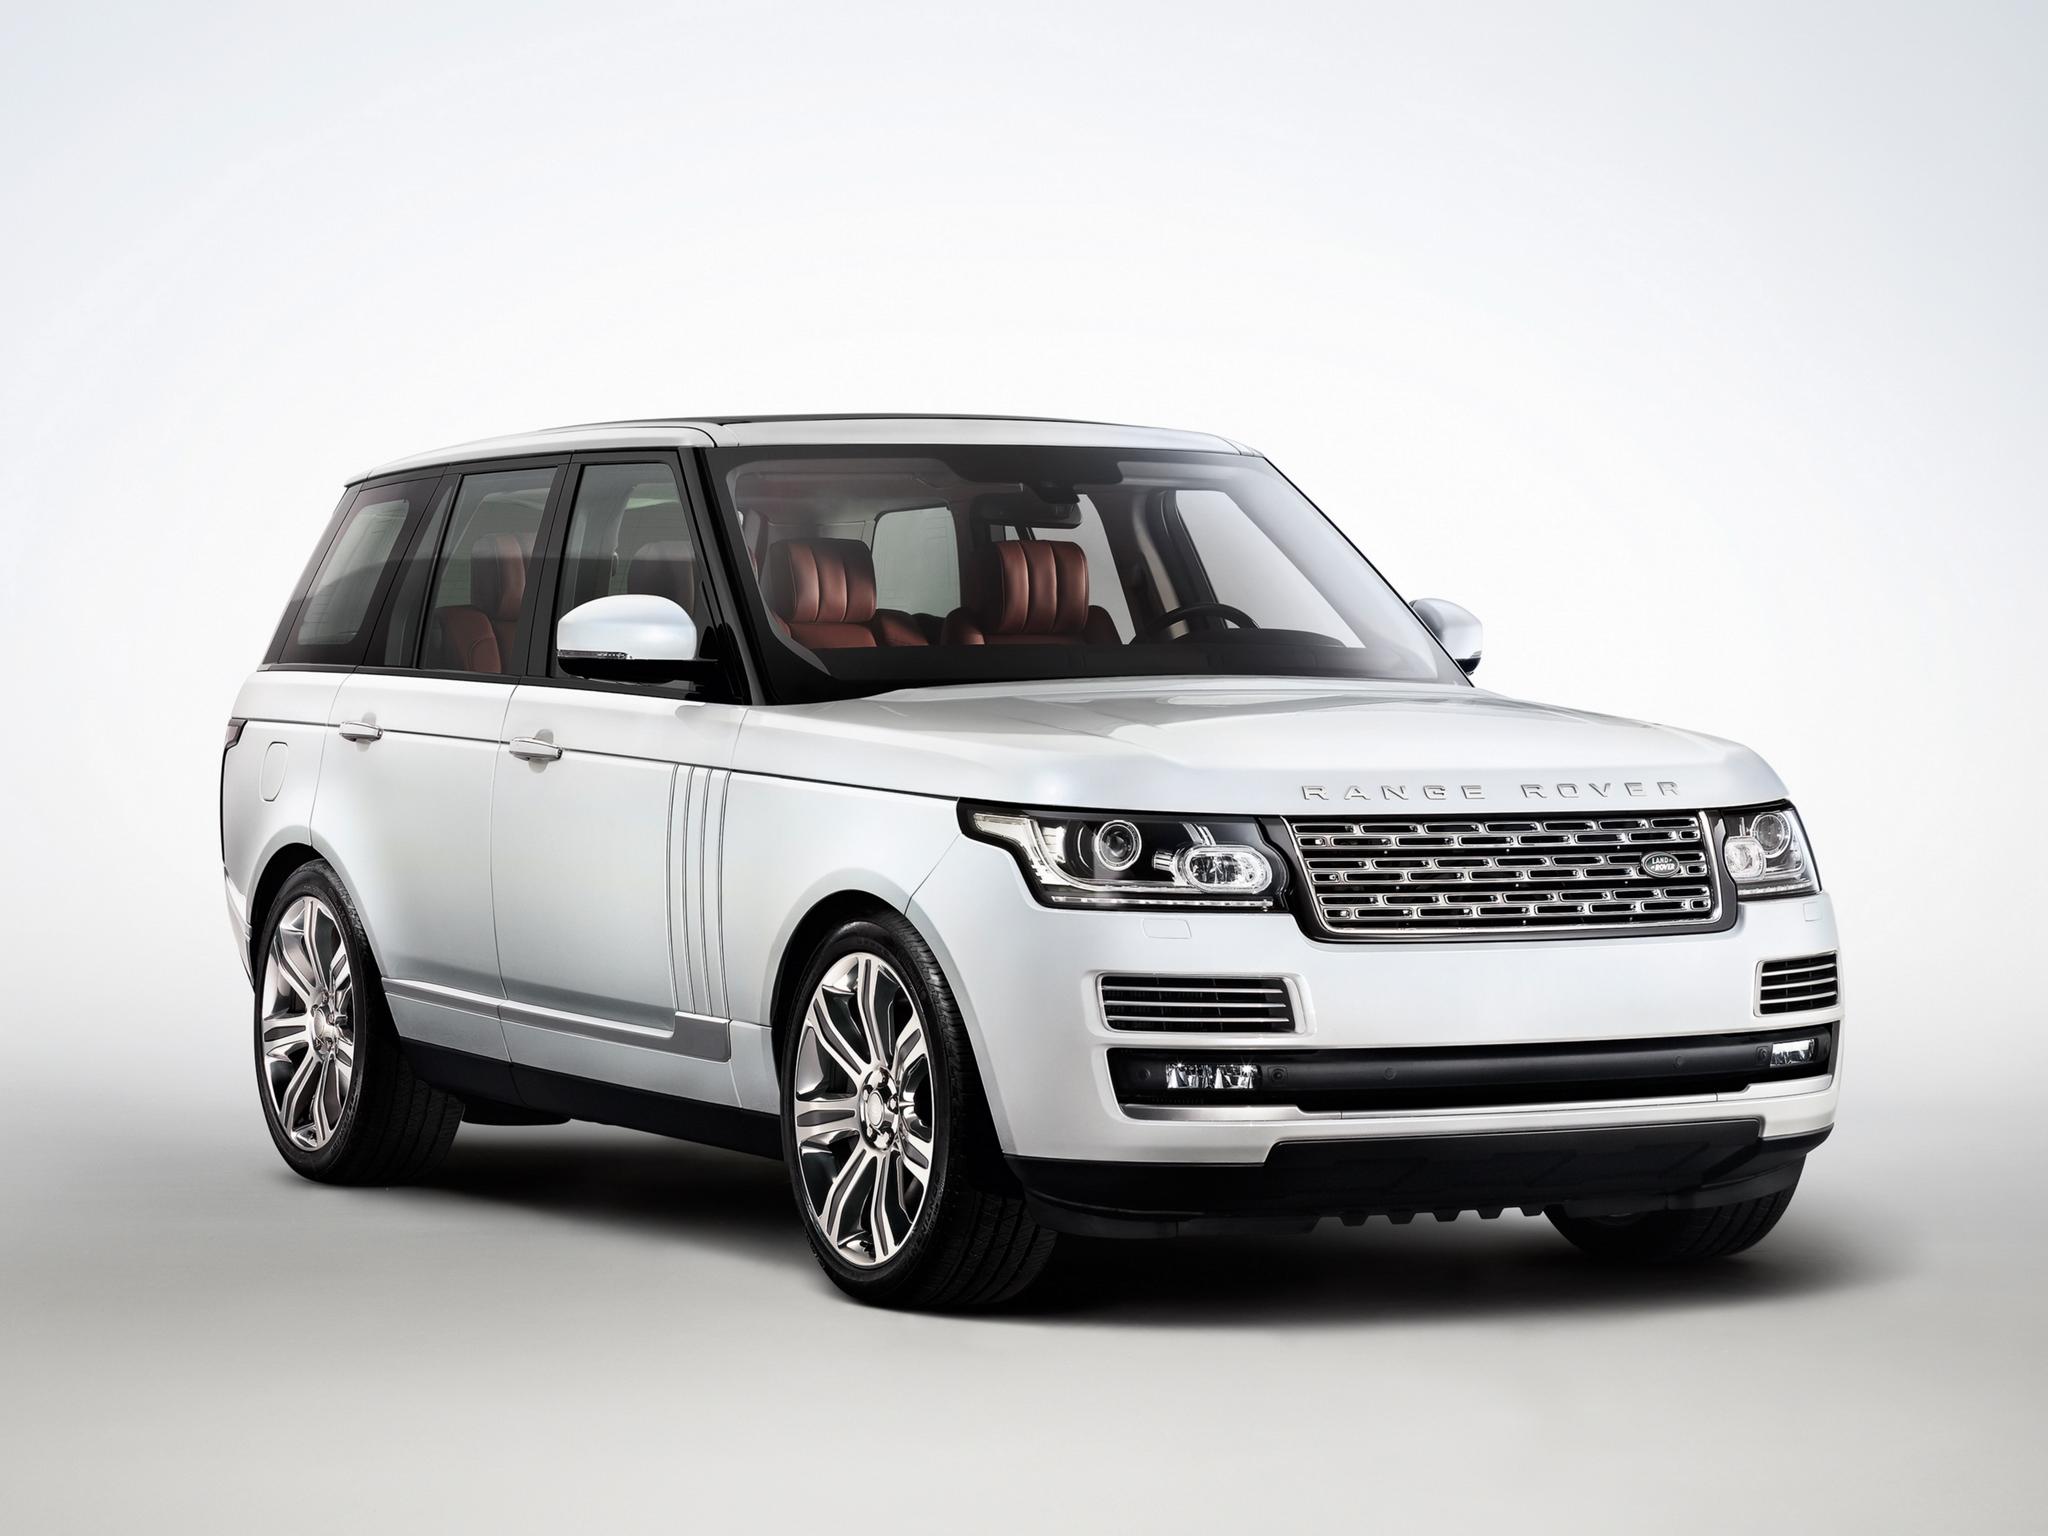 2014 range rover autobiography black l405 suv luxury. Black Bedroom Furniture Sets. Home Design Ideas